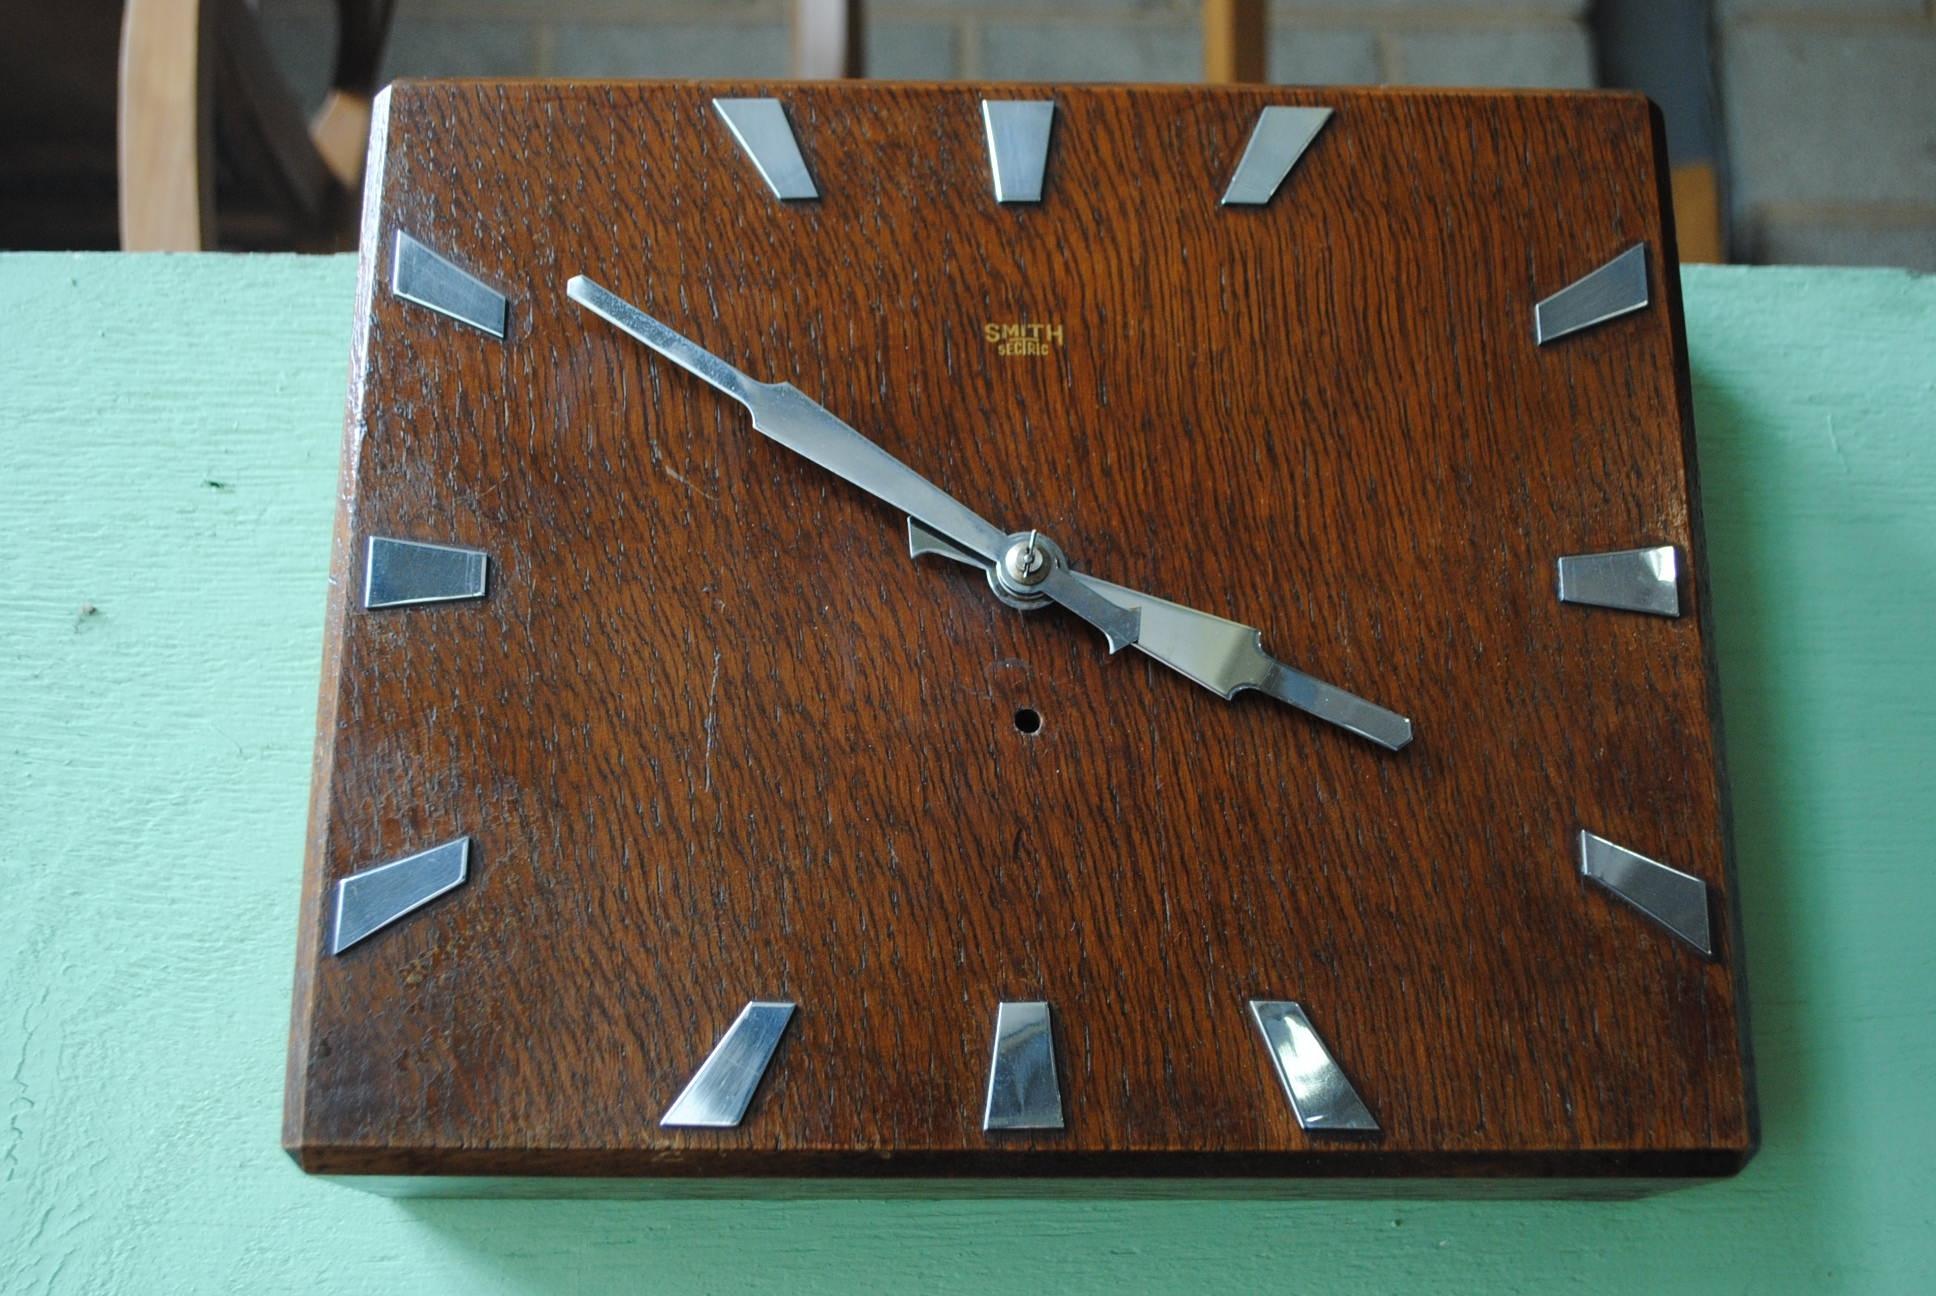 Art Deco Wall Clock || Cloud 9, Art Deco Furniture Sales with regard to Art Deco Wall Clock (Image 7 of 20)